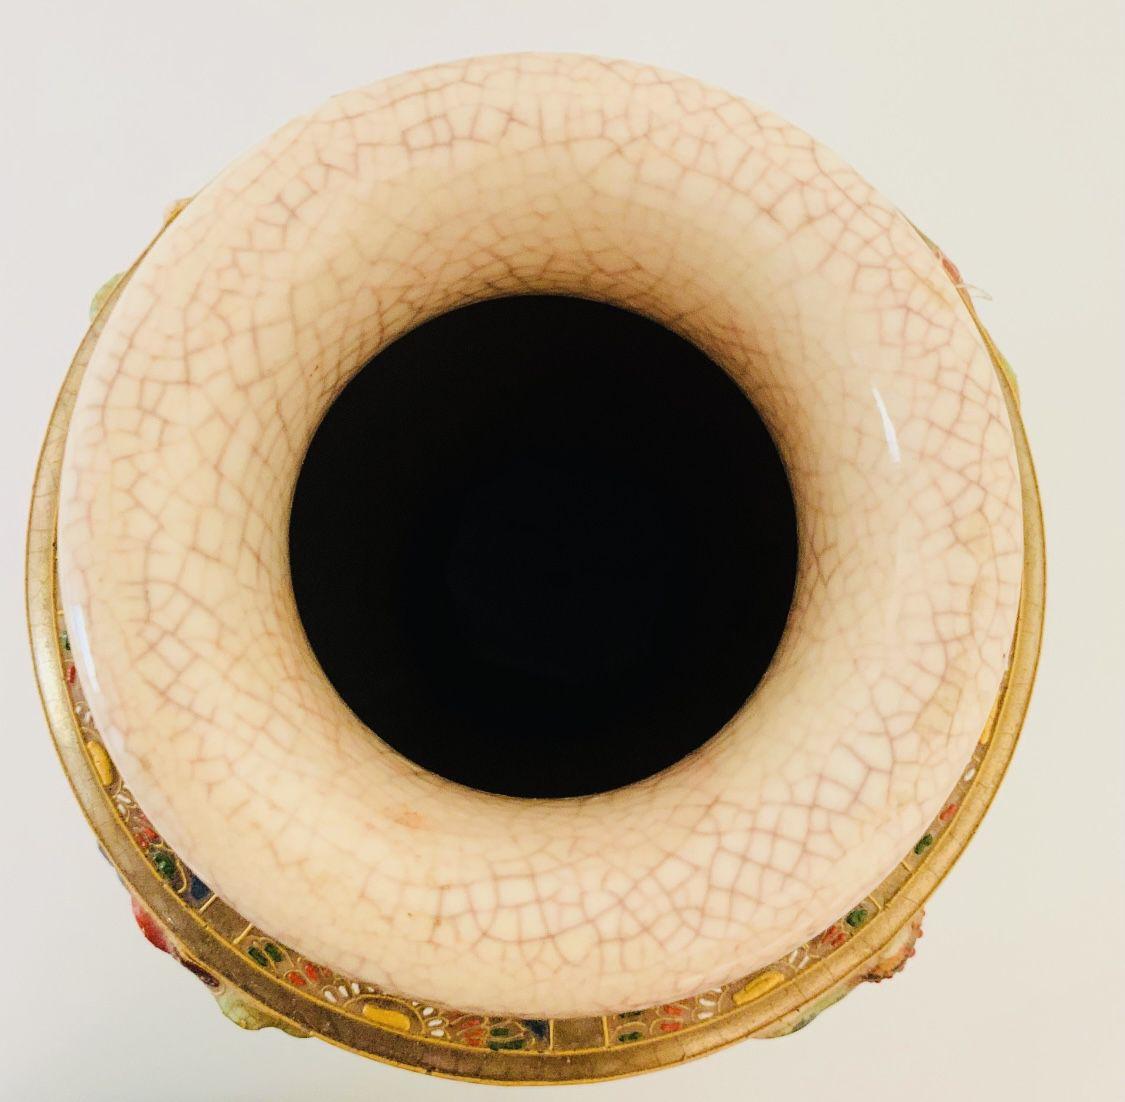 JAPANESE SATSUMA HAND PAINTED VASE WITH RAISED SAMURAIS AND GEISHAS